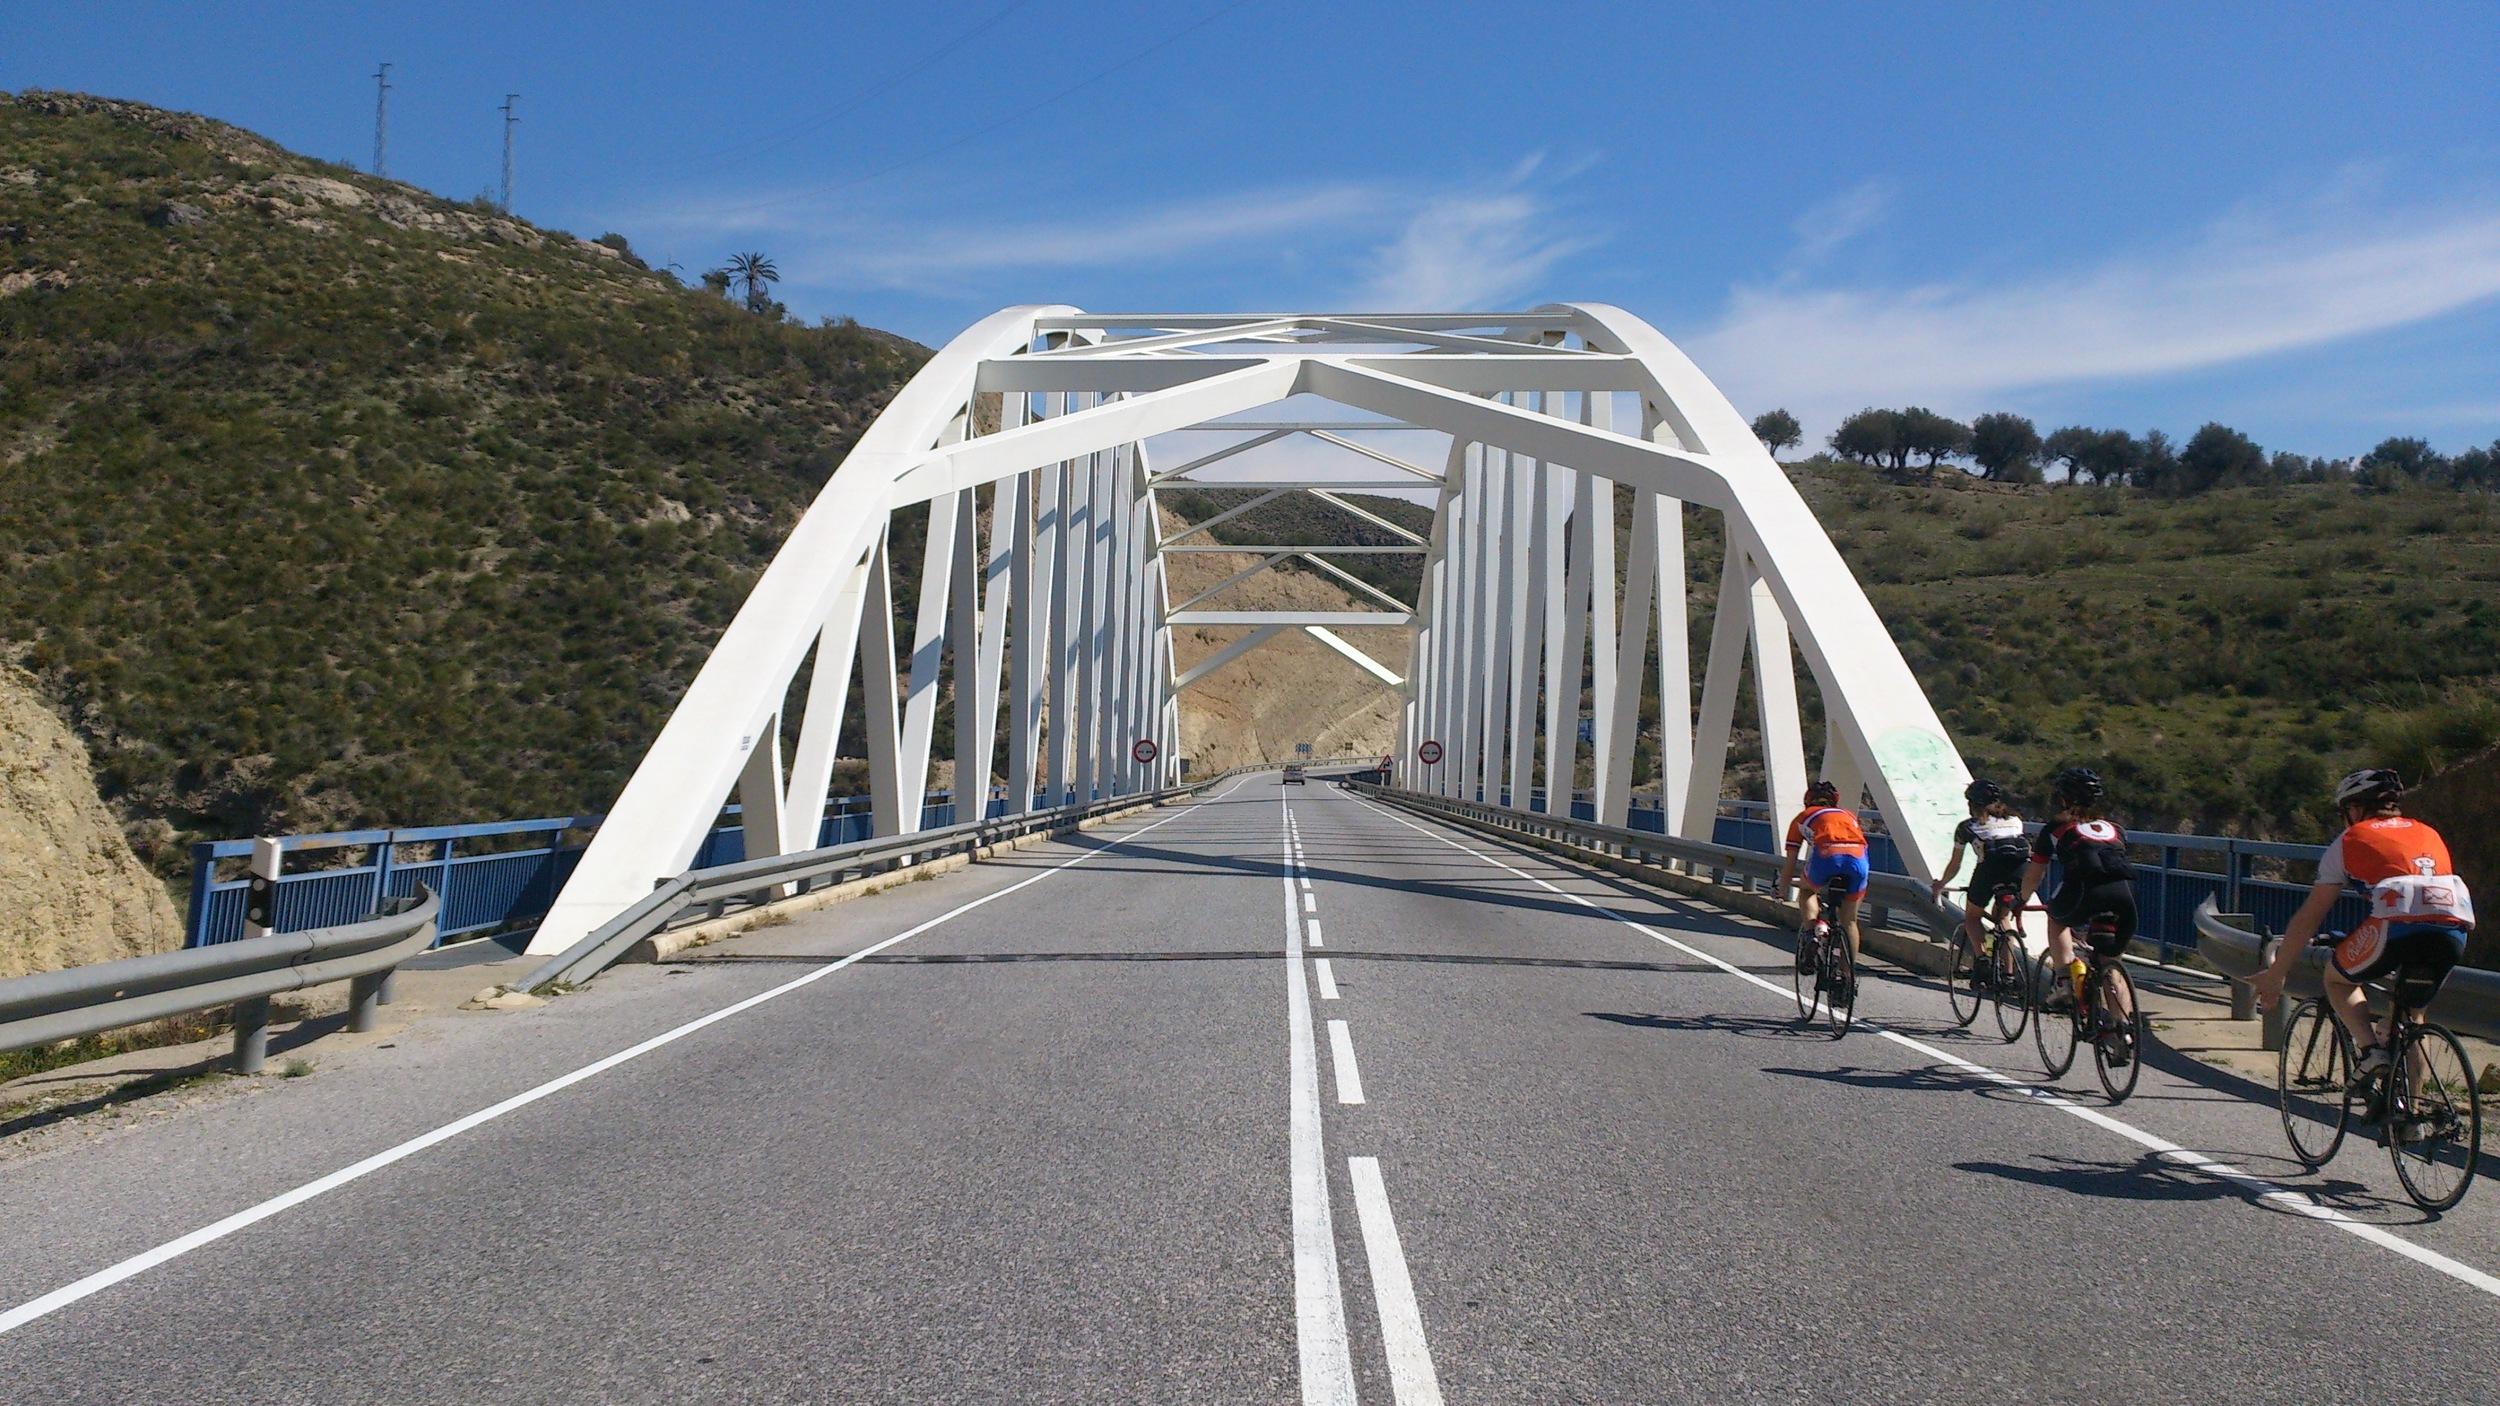 YOGA CYCLING HOLIDAY CYCLE VACATION SPAIN SIERRA NEVADA ANDALUSIA WINTER SPRING CYCLING BREAK YOGA